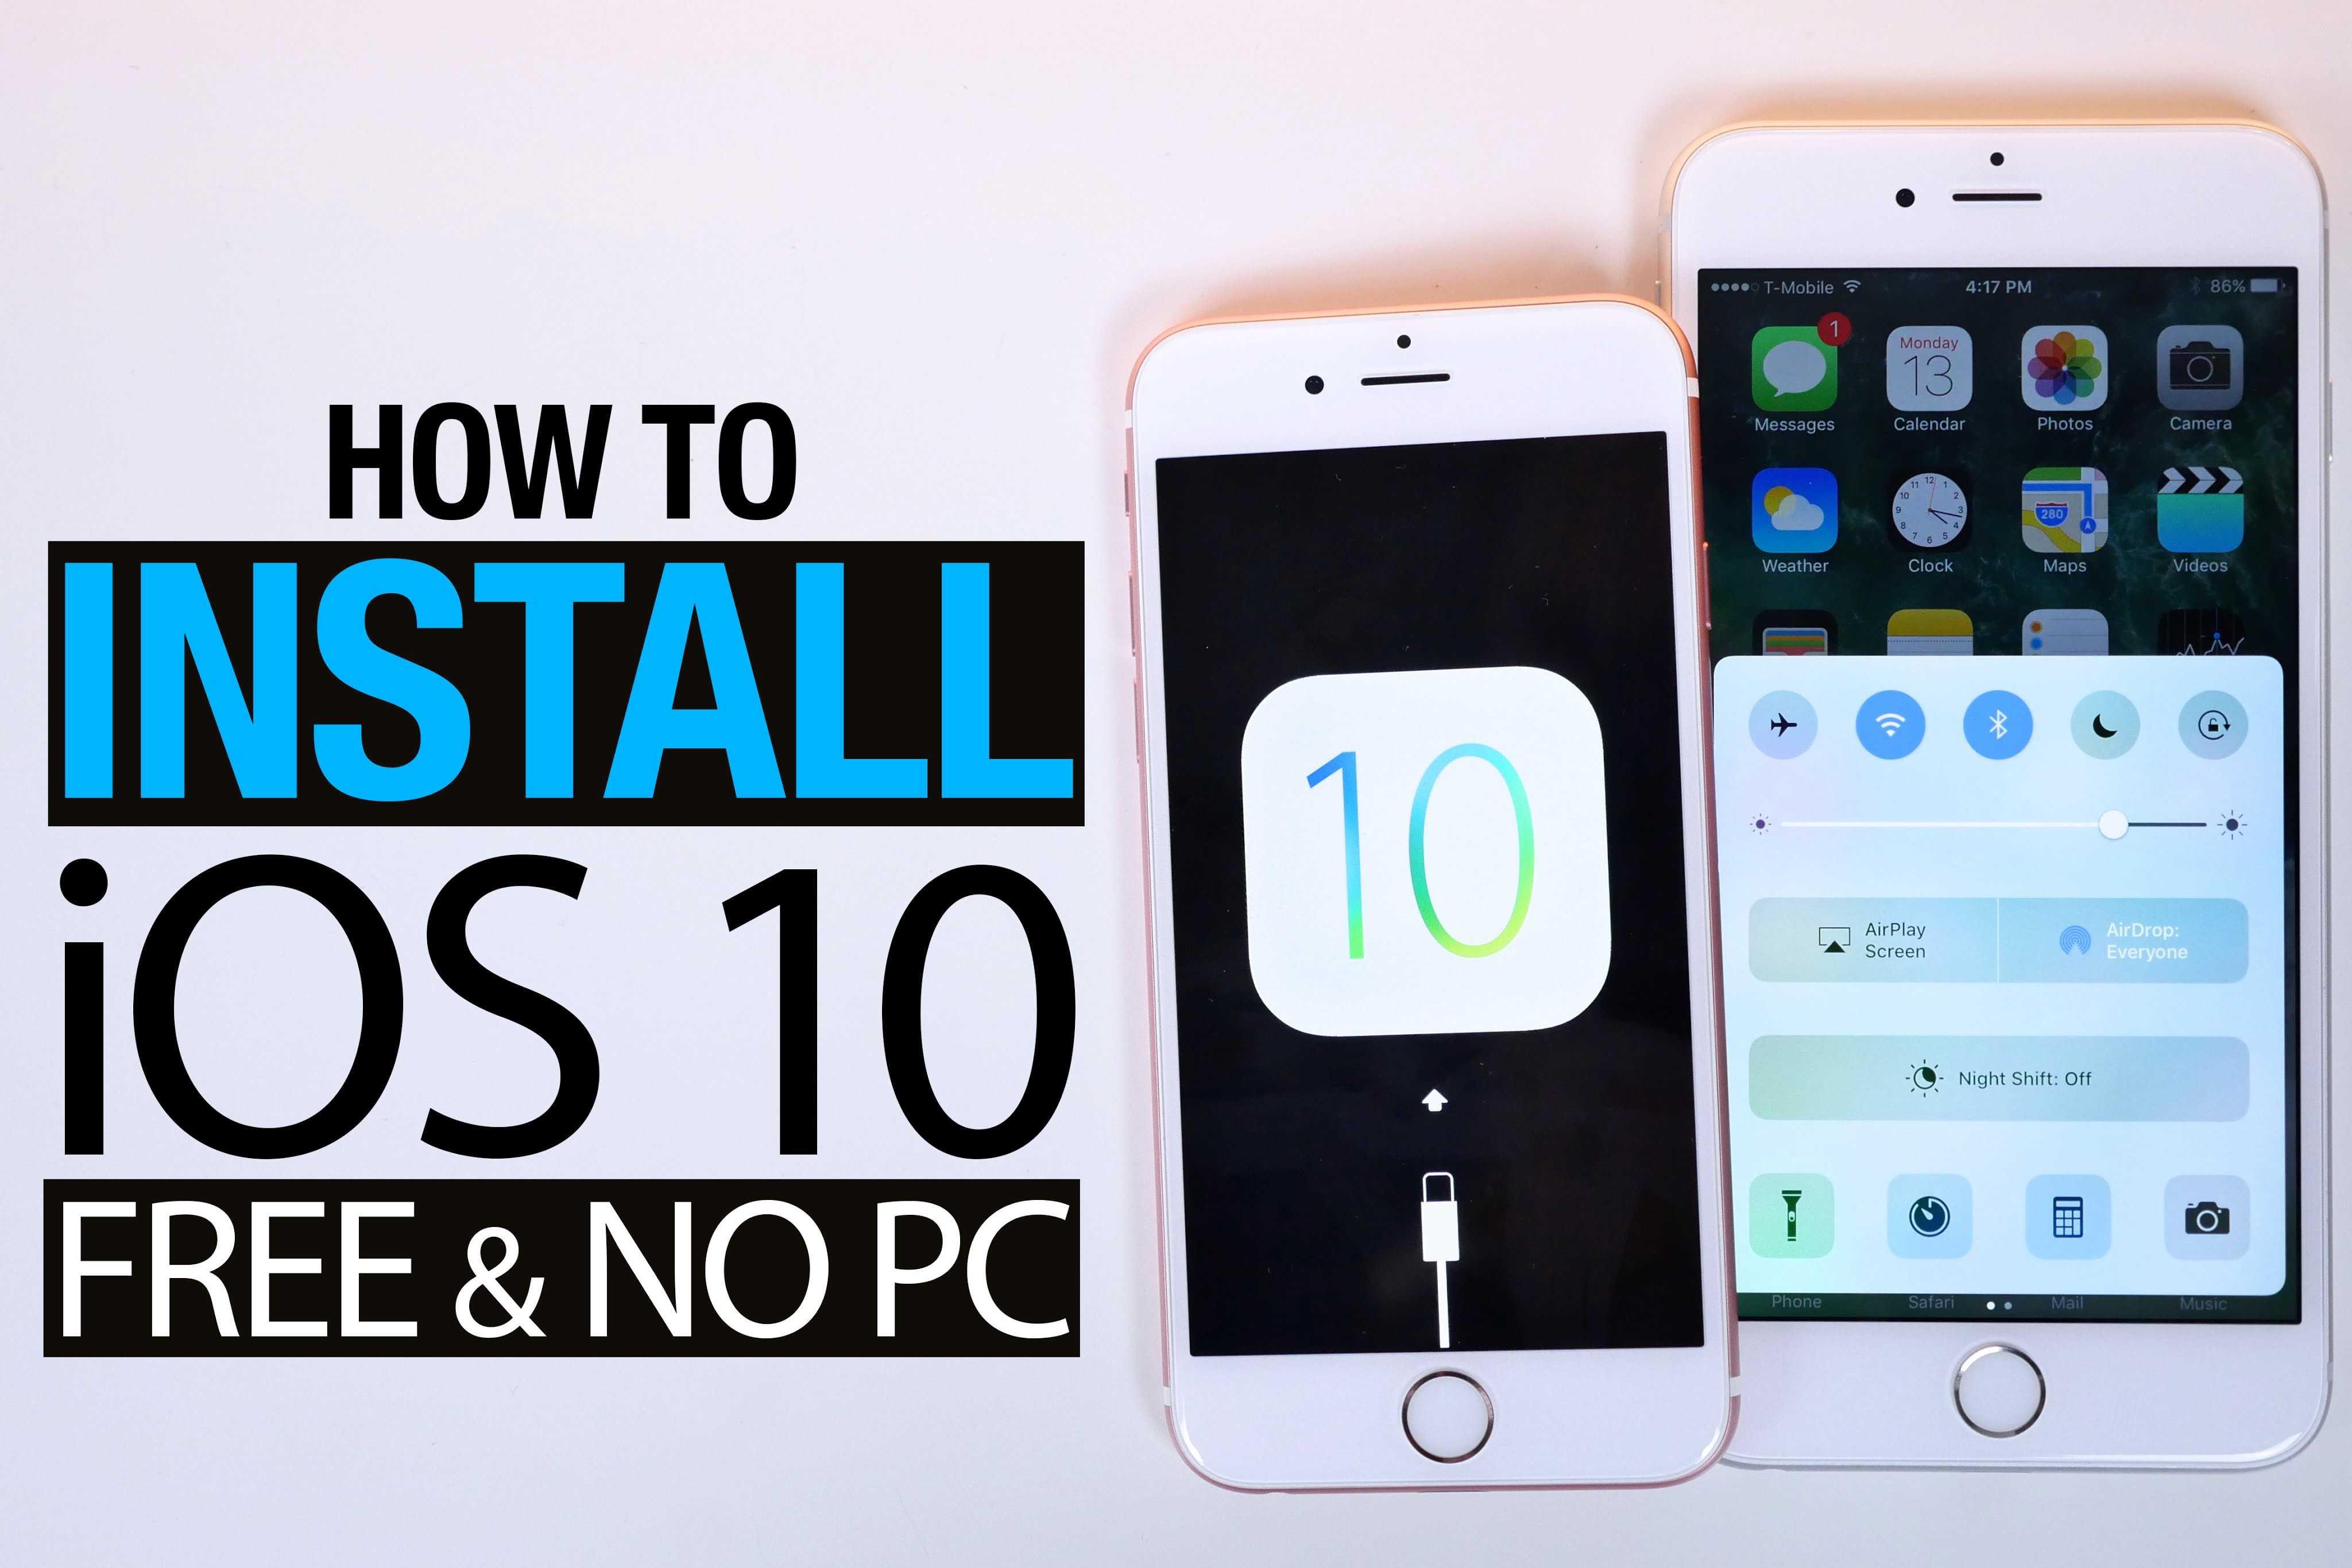 download 10 iphone -#main